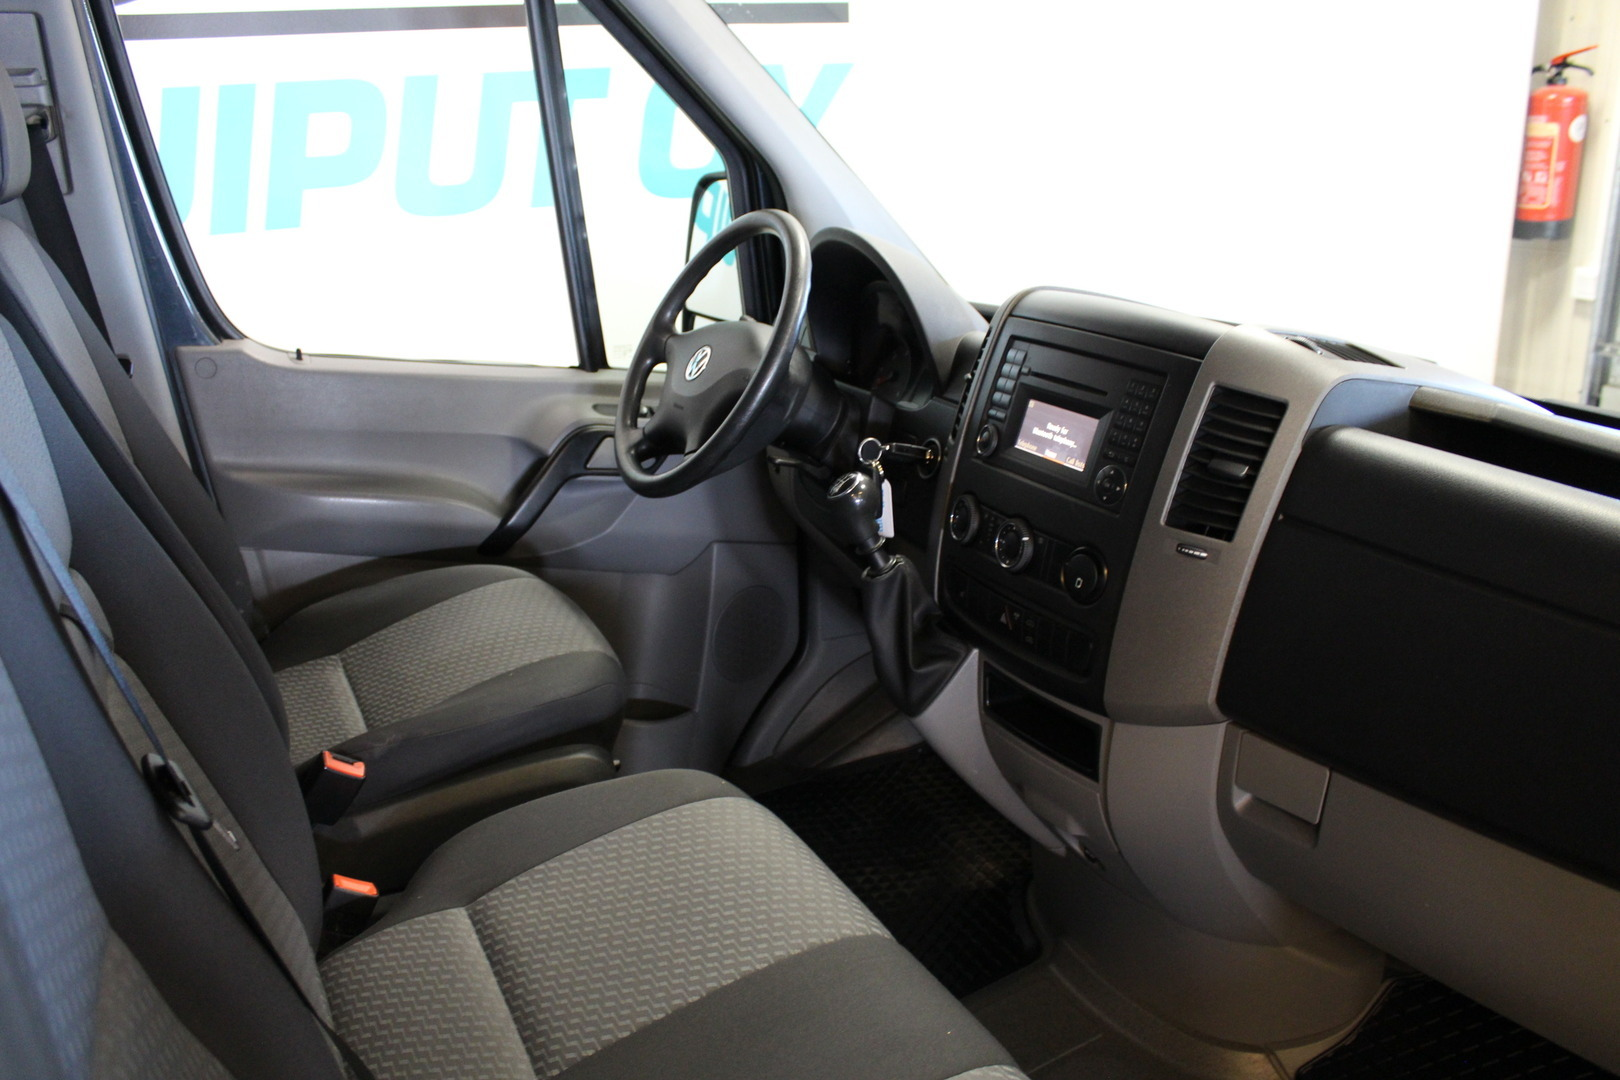 Volkswagen Crafter, 35 umpipakettiauto Black 2,0 TDI 100 kW, korkea, 3665